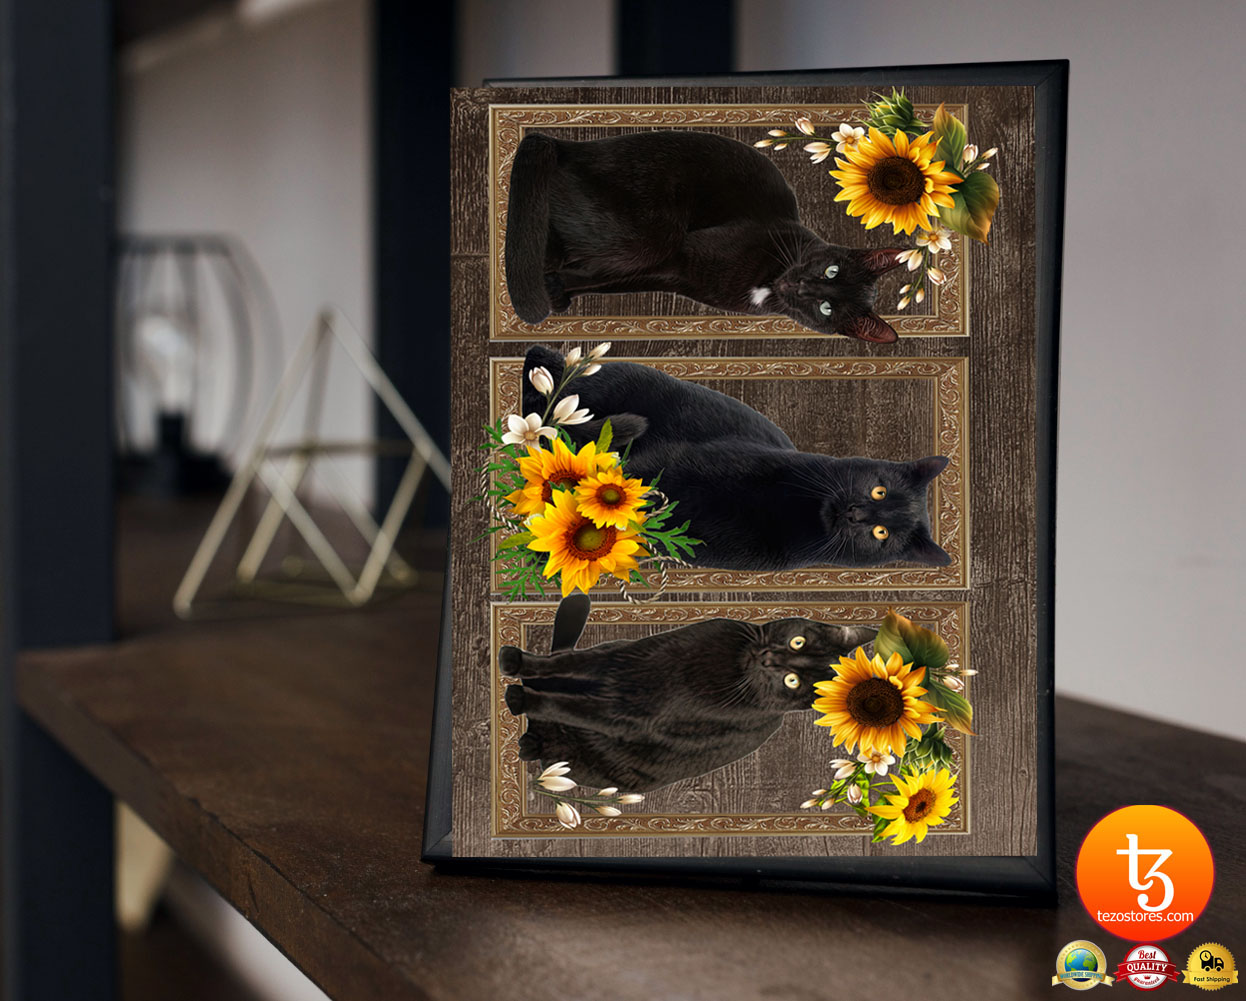 Black cat sunflower frame doormat 19